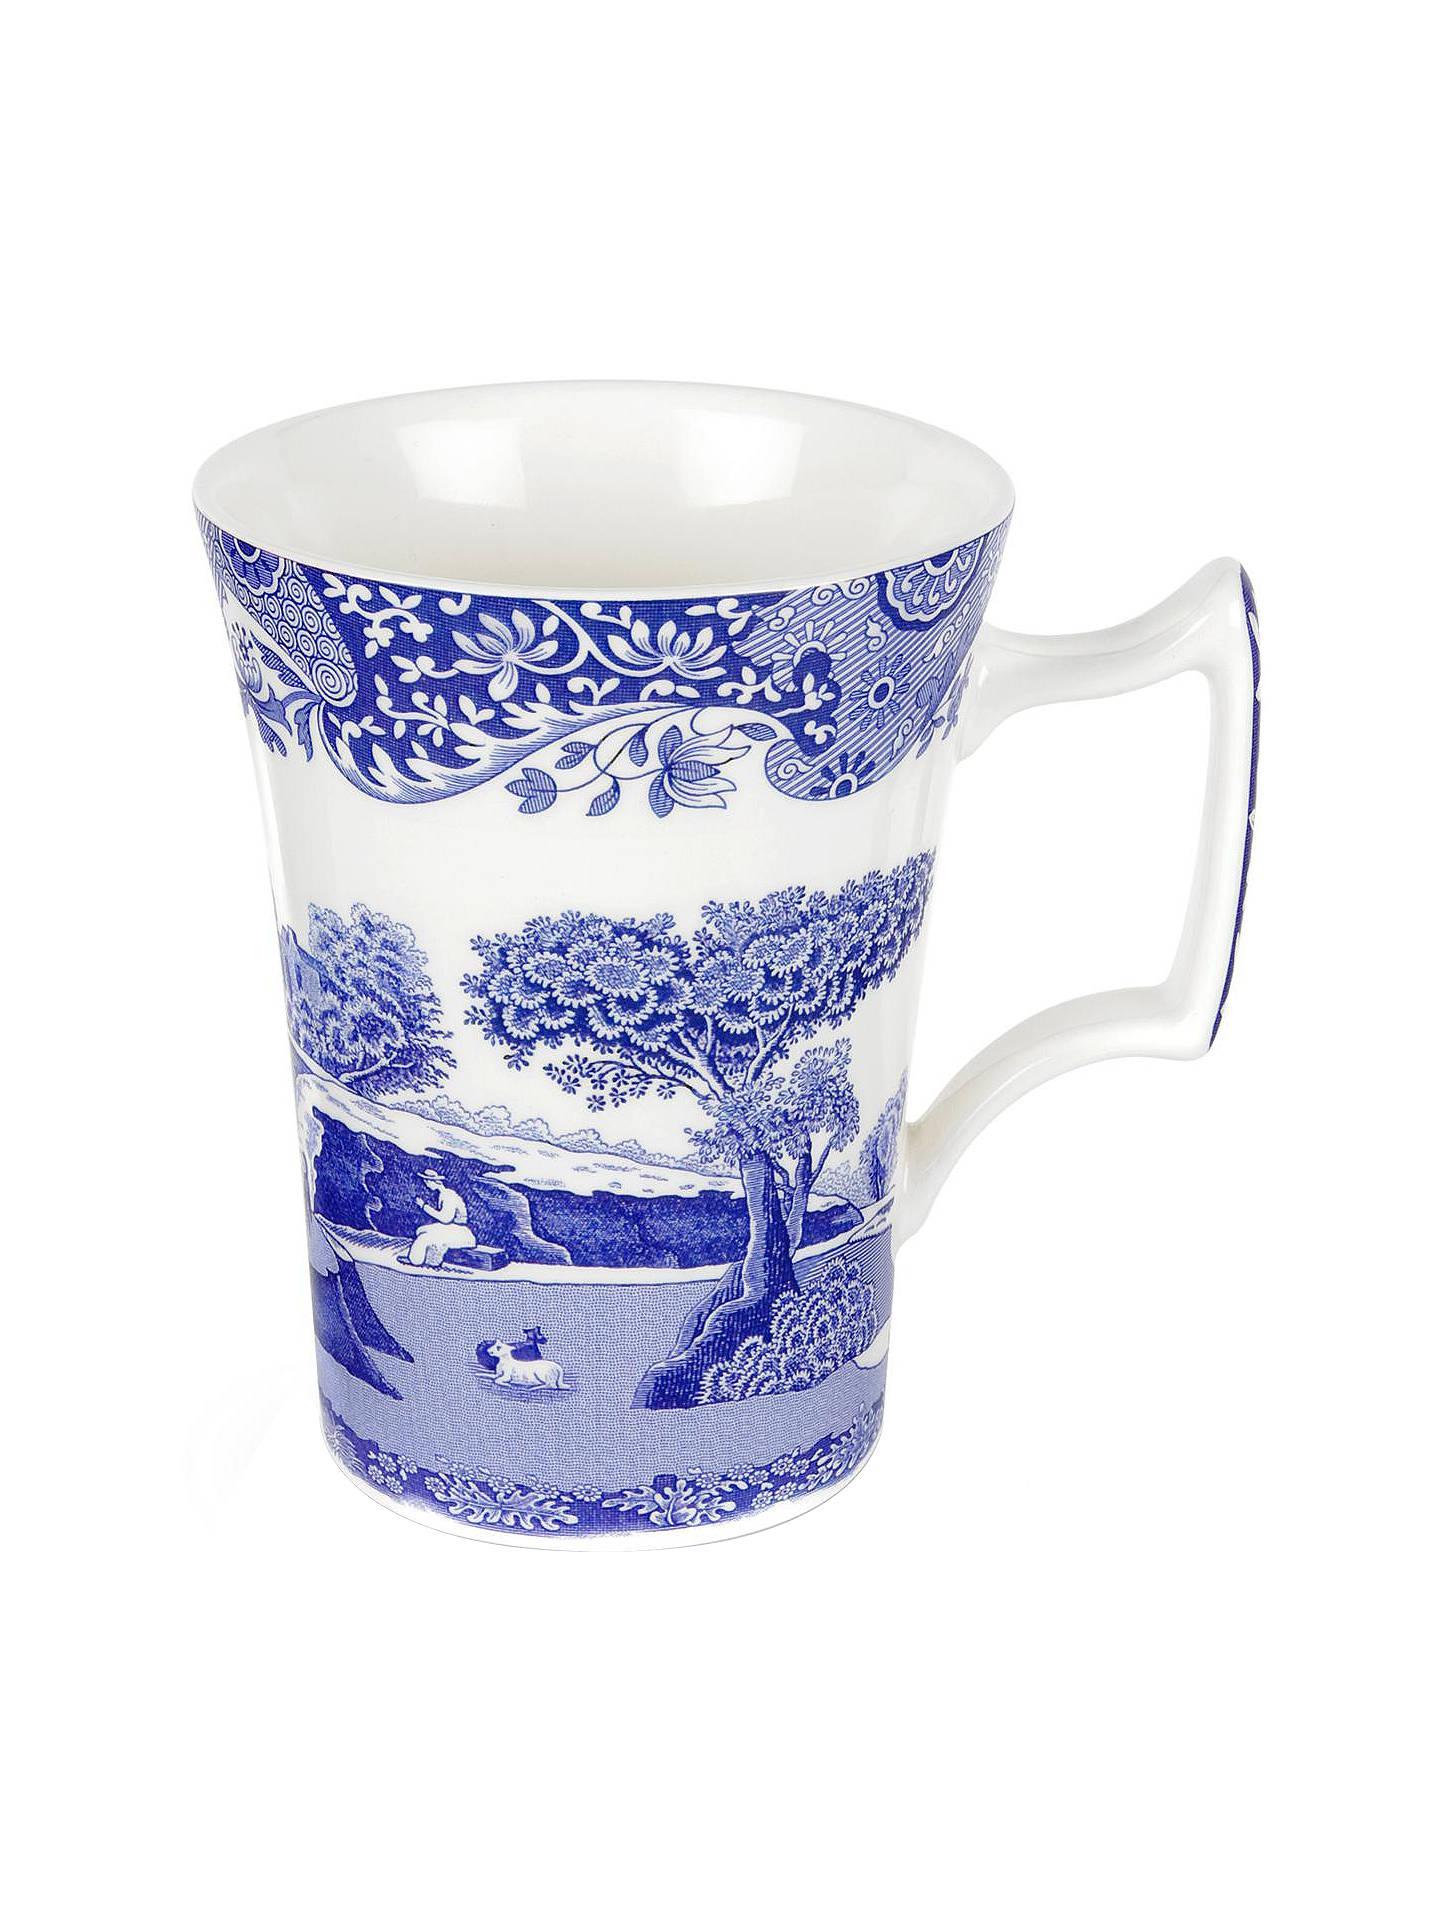 Spode Blue Italian Mug Online At Johnlewis